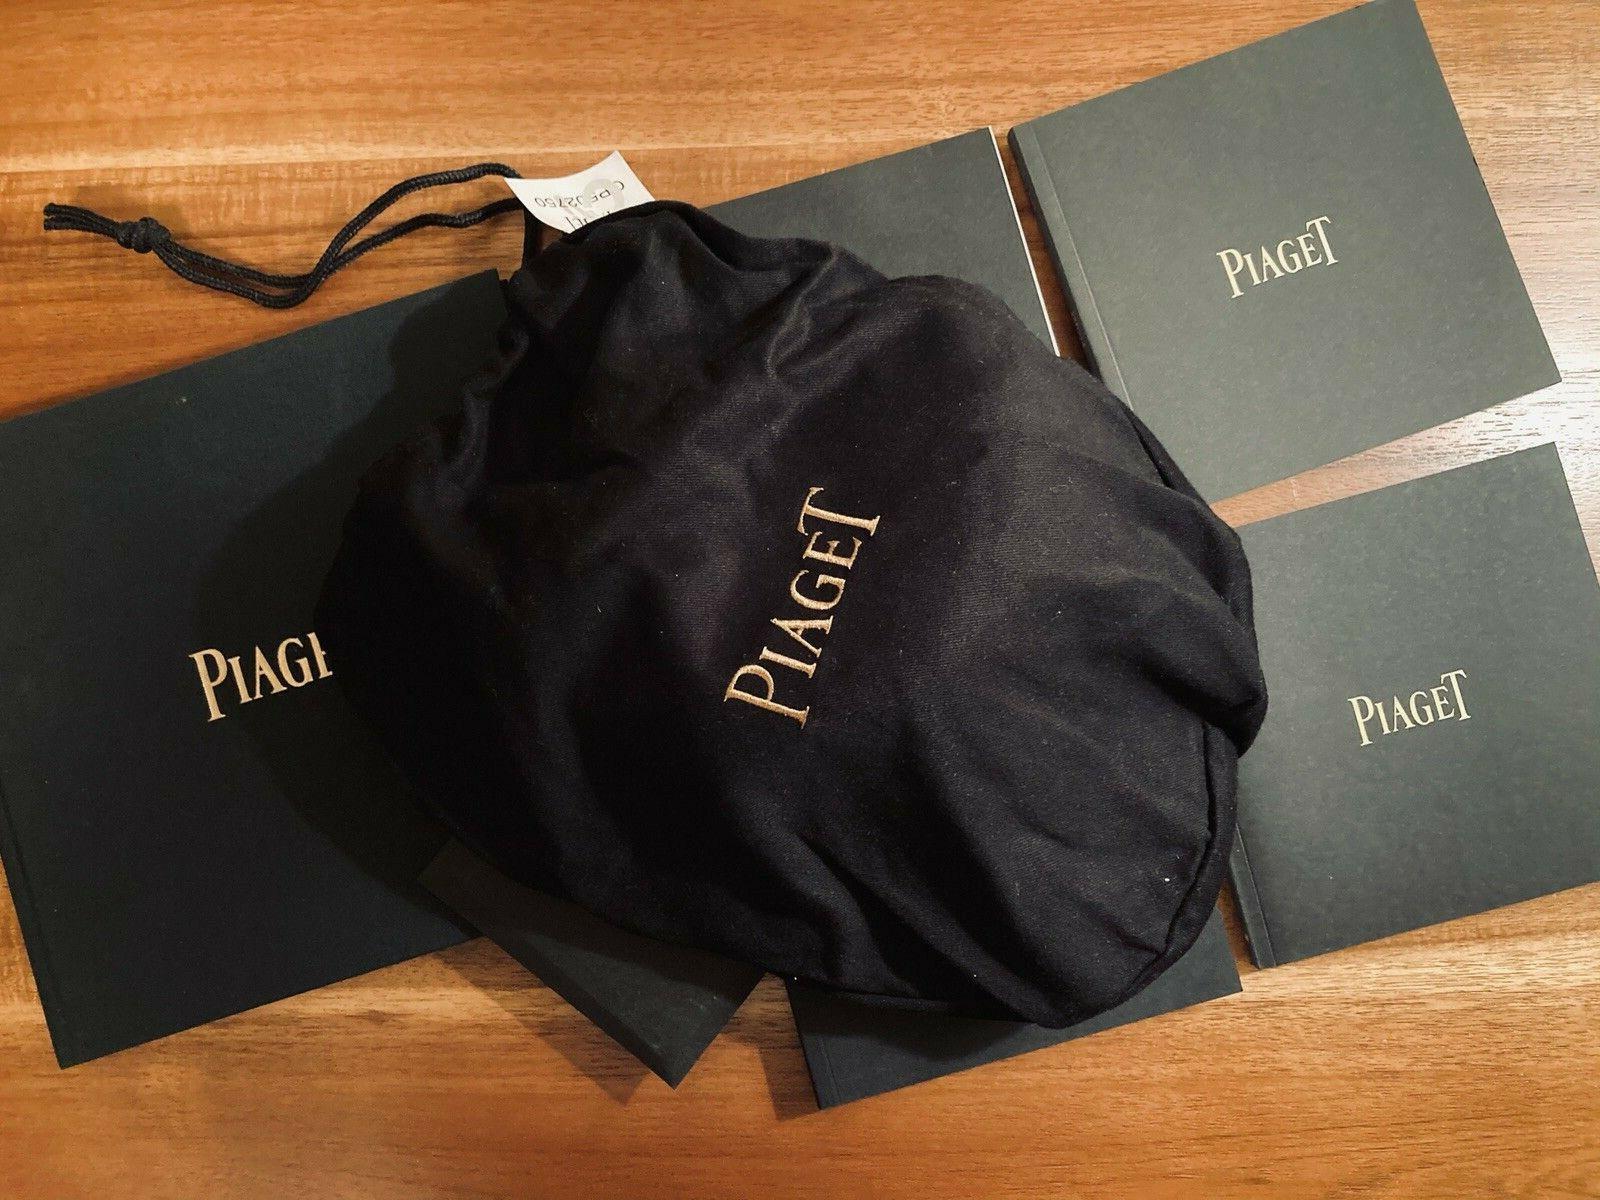 New Genuine Piaget Catalog Baseball cap hat bag black tie collectibles CD book